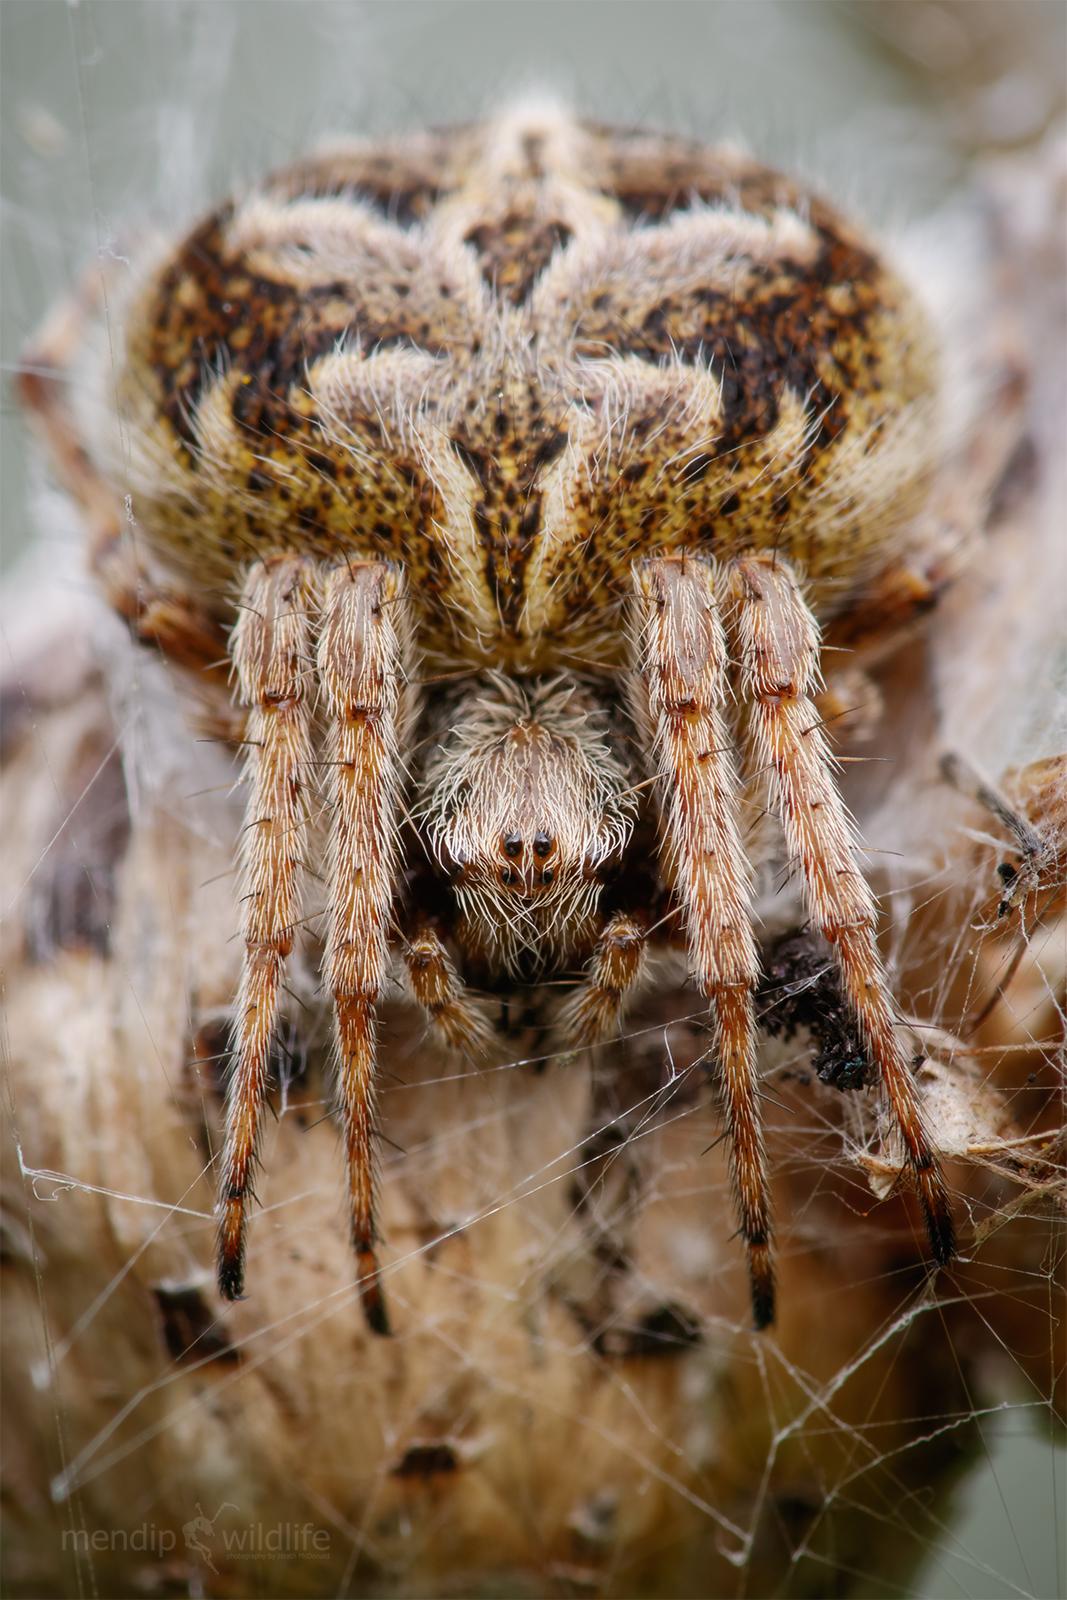 Orb Weaver - Agalenatea redii...